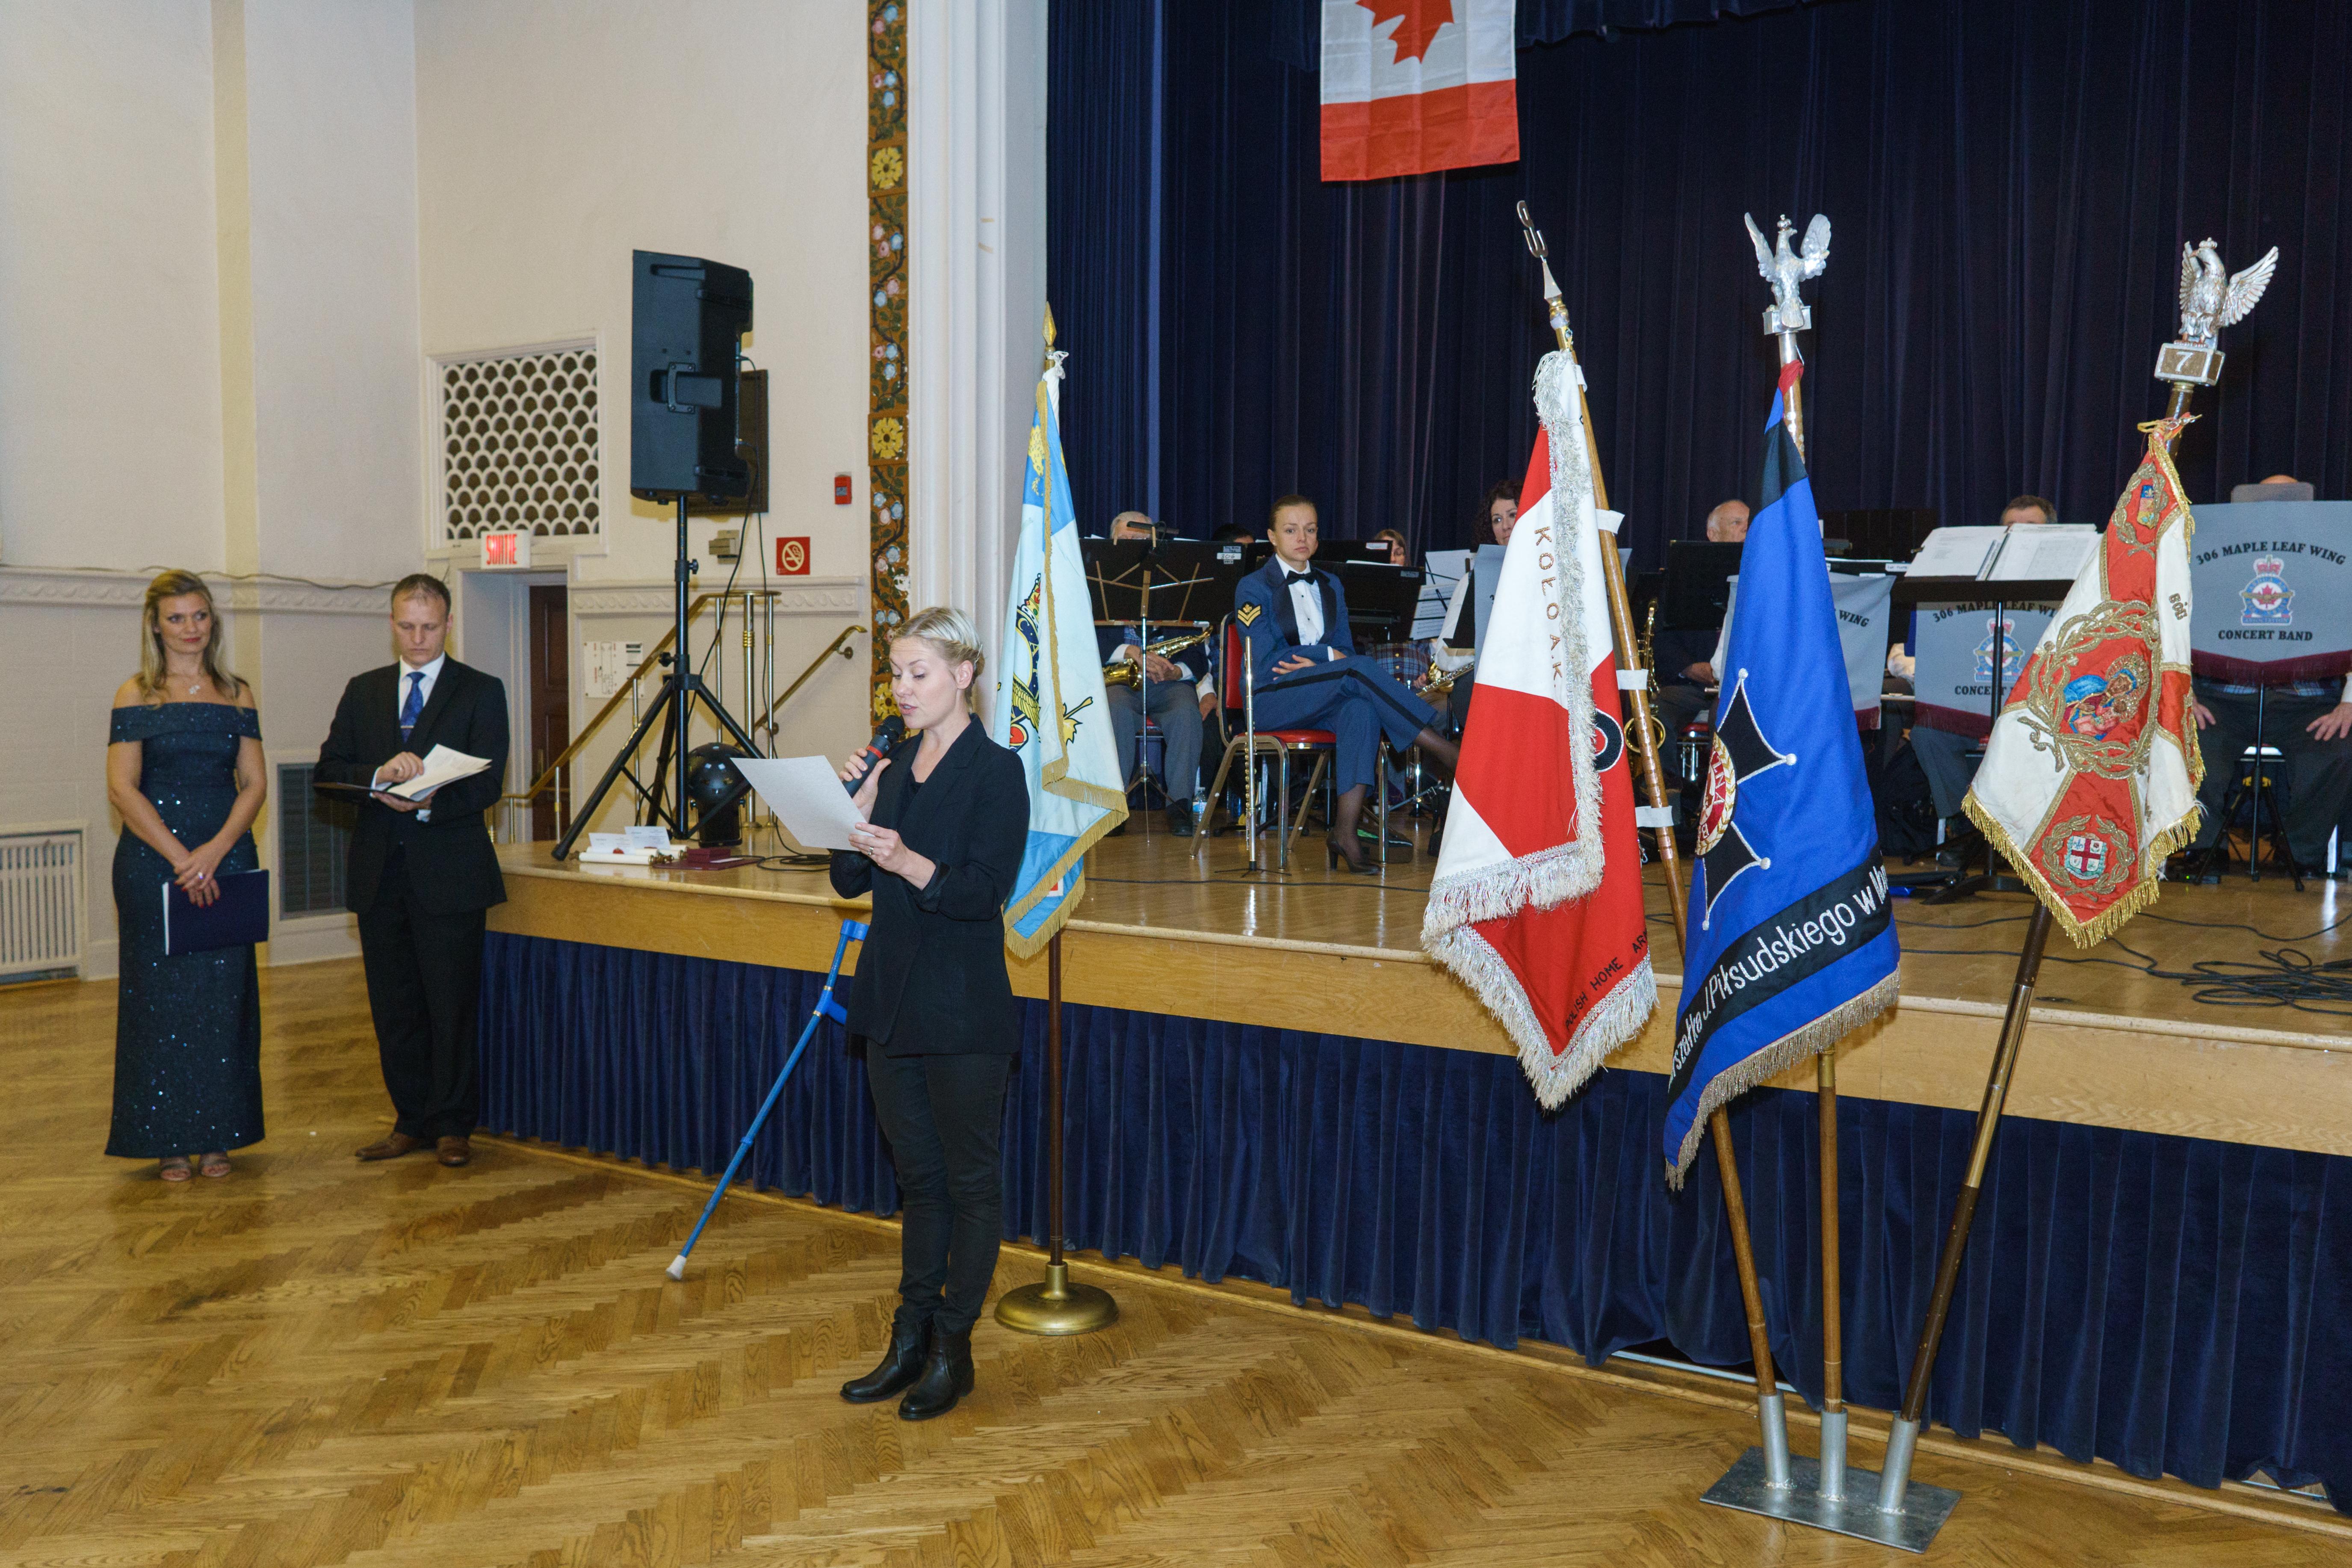 P. Konsul Pia Libicka